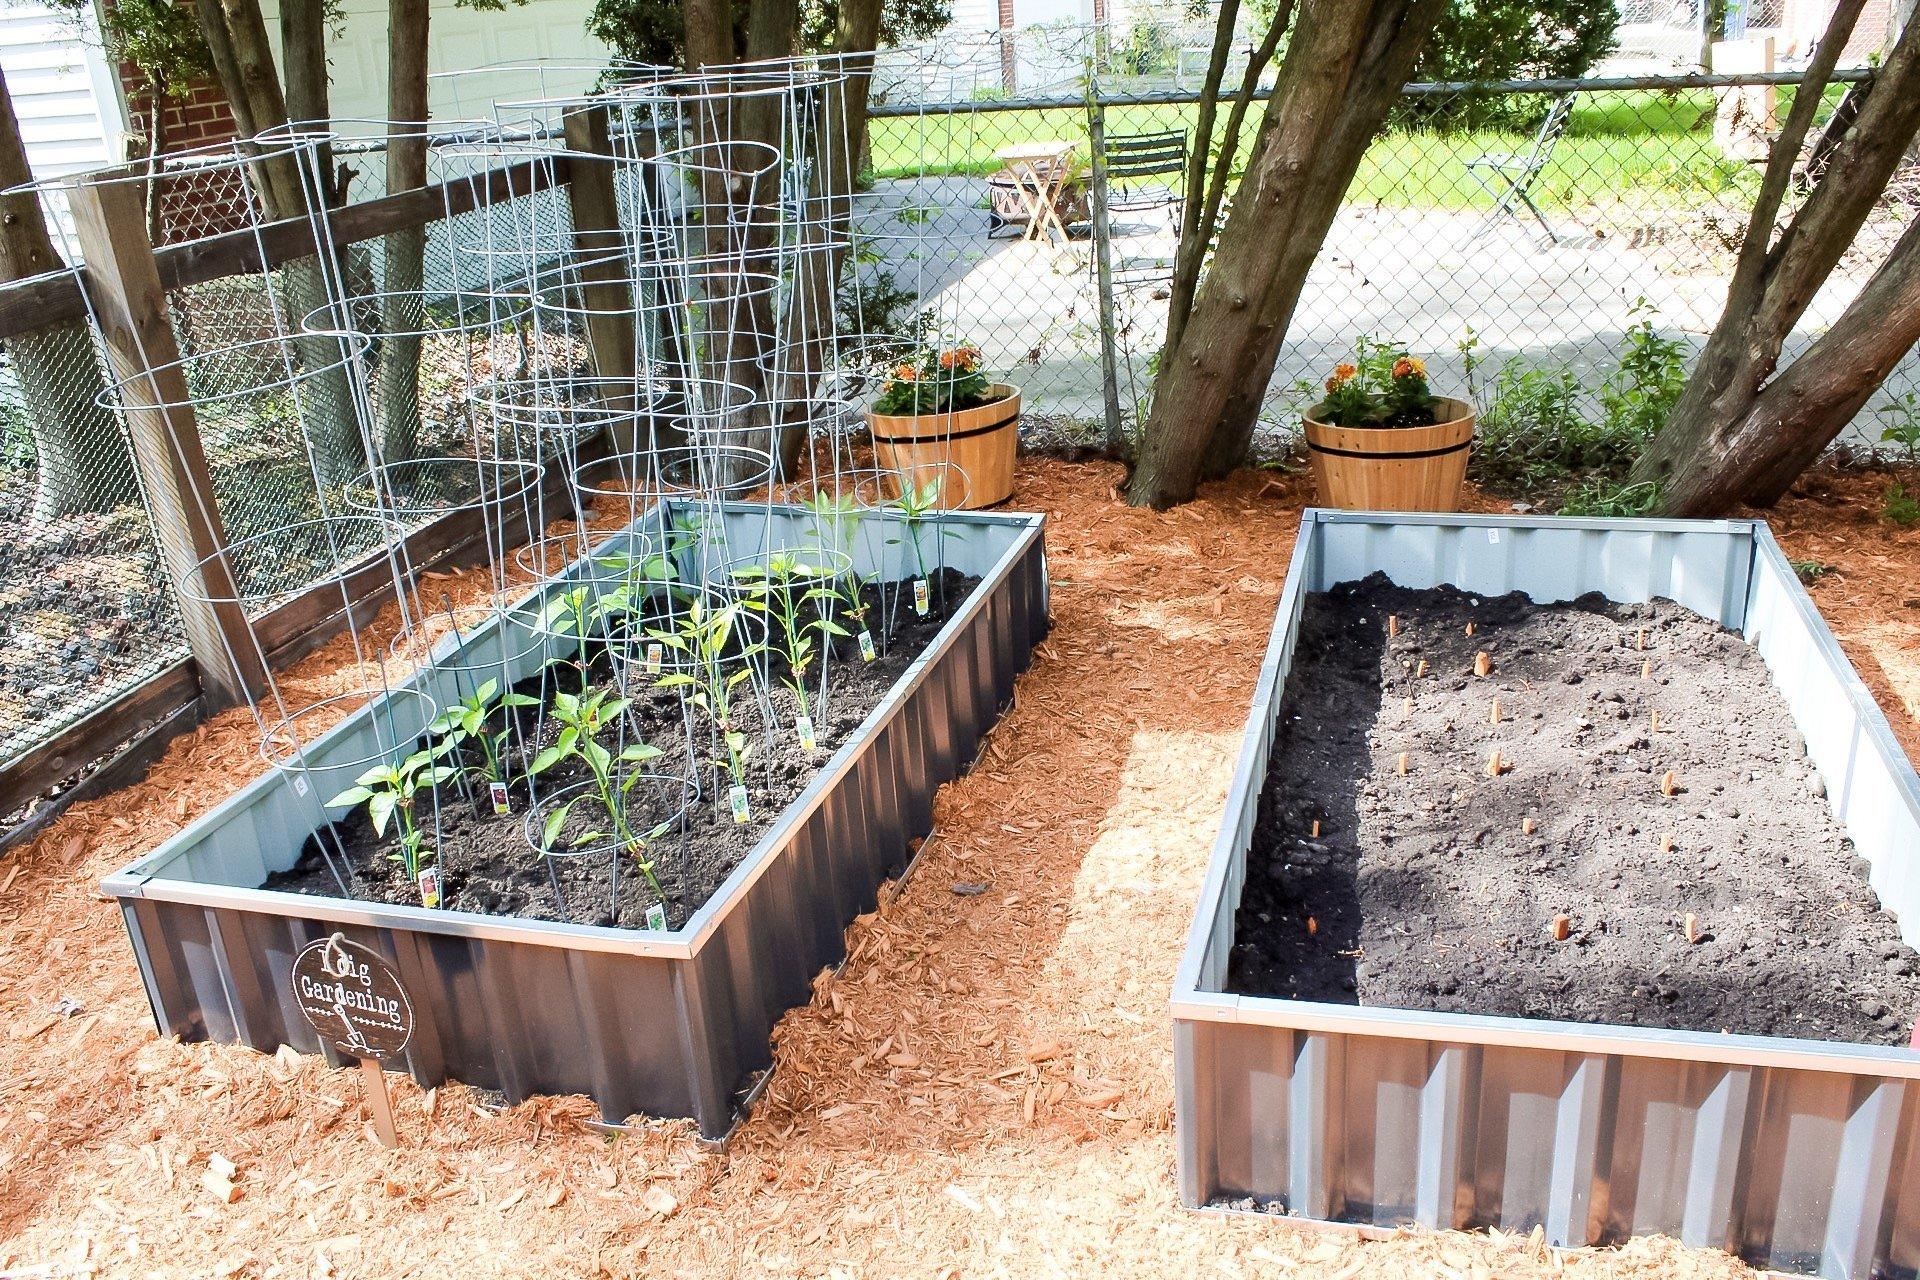 gardening tips - rows